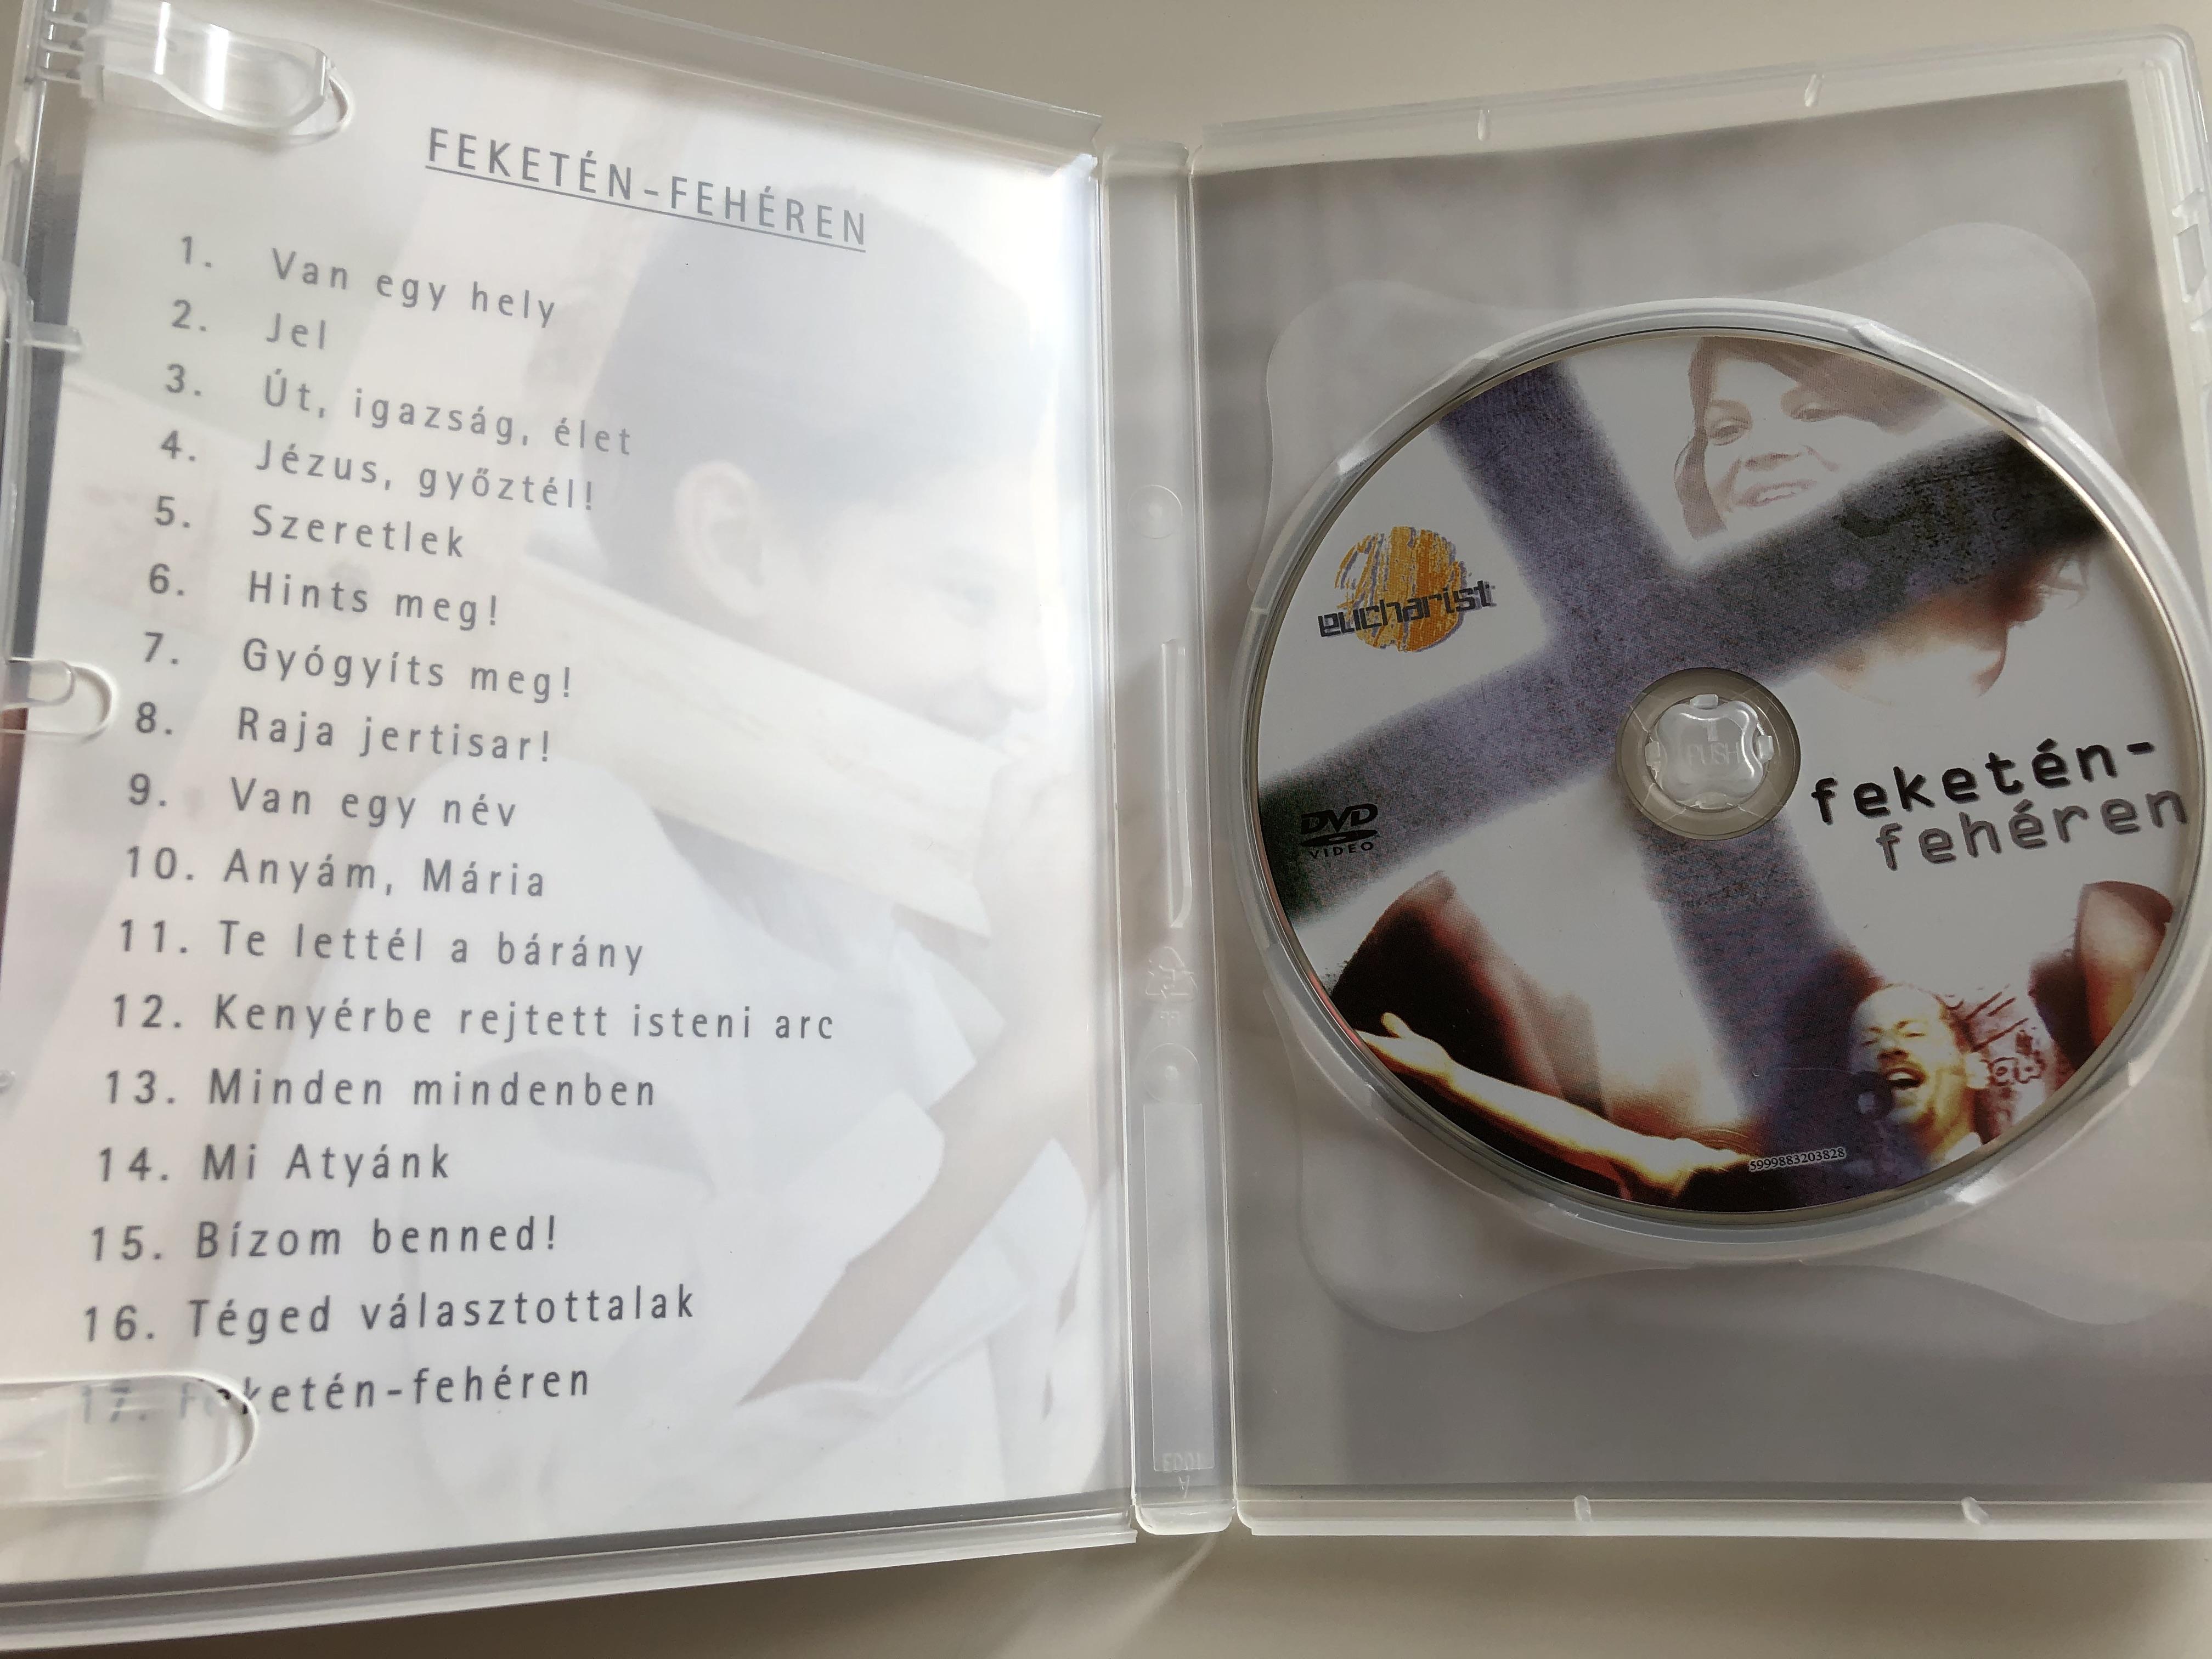 feket-n-feh-ren-dvd-2010-cig-nyok-s-nem-cig-nyok-egys-gben-j-zussal-eucharist-dics-t-koncert-2010-etalon-film-hungarian-praise-and-worship-concert-dvd-2-.jpg